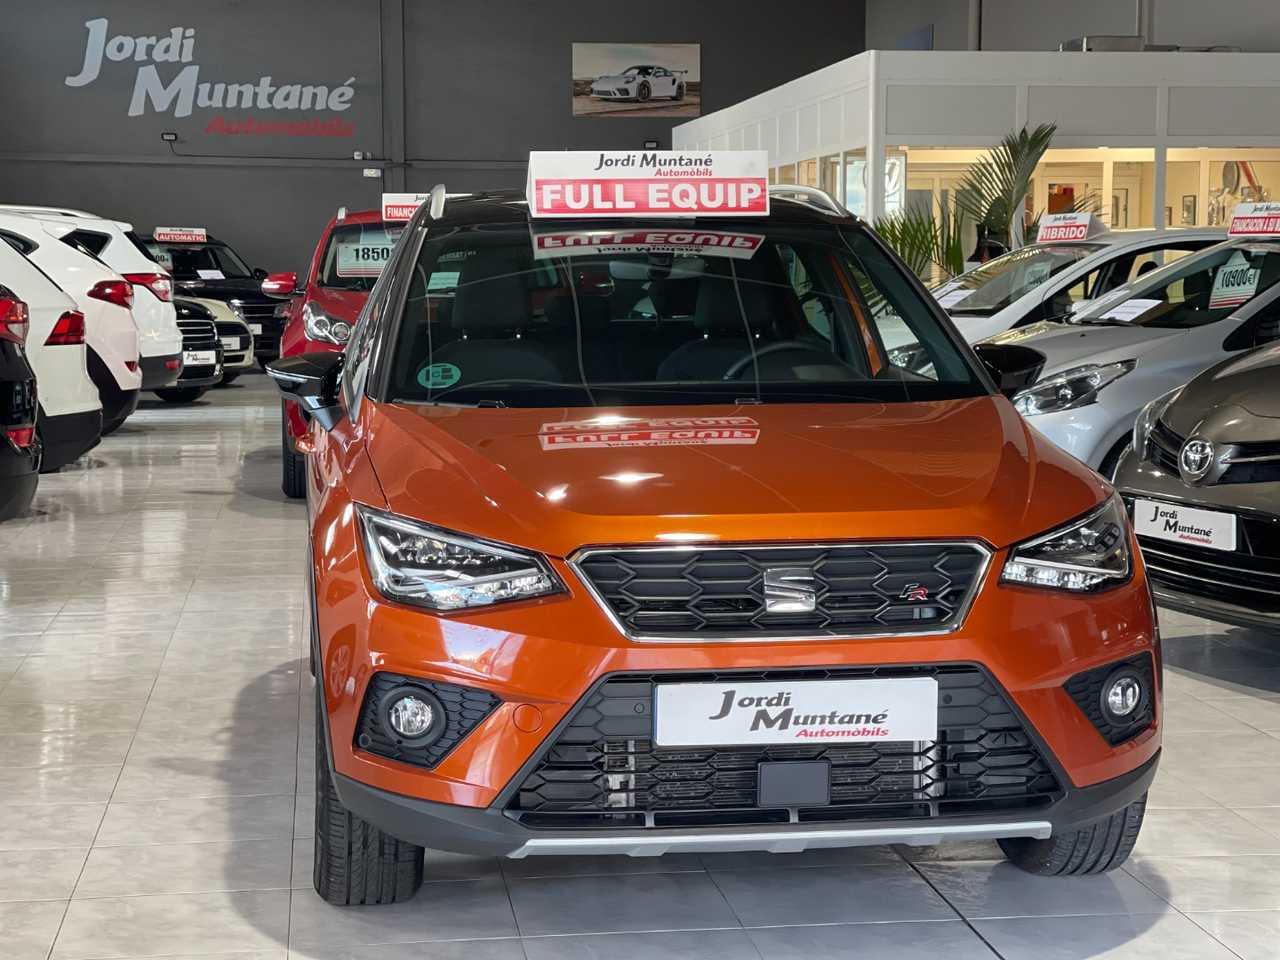 Seat Arona 1.0 TSI 115cv FR ECOMOTIVE S/S -. '' FULL EQUIP '' .-